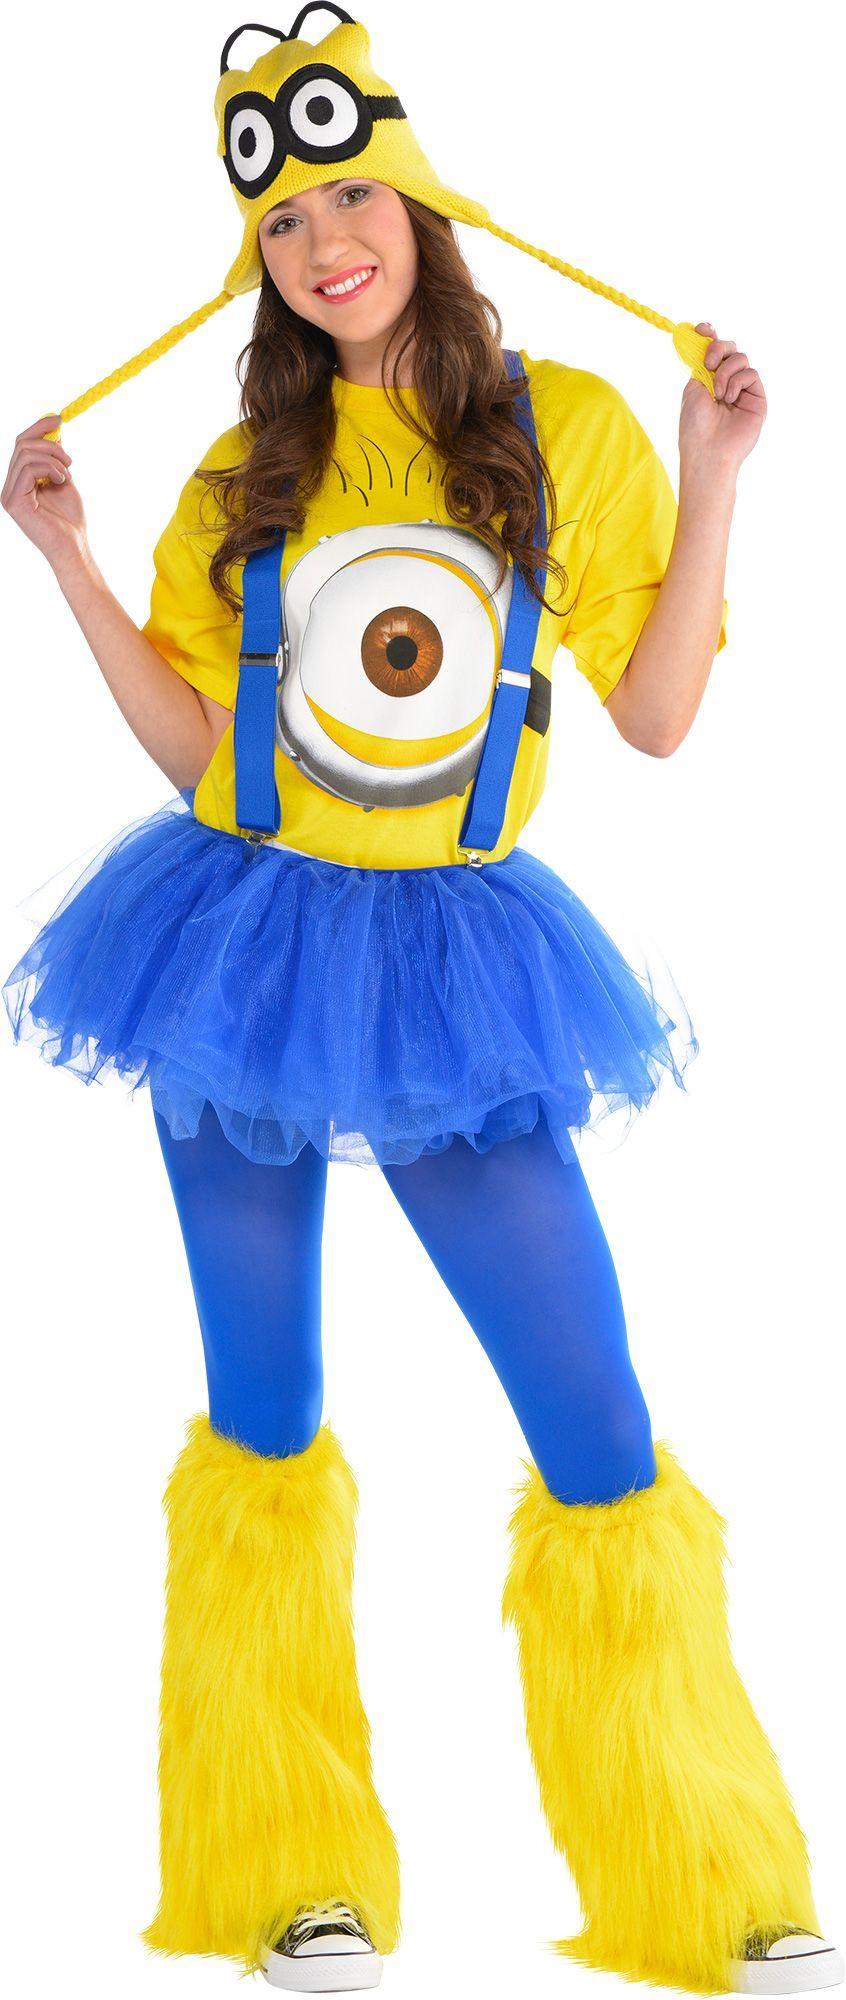 Make Your Costume Womens Minion 3 Minion halloween